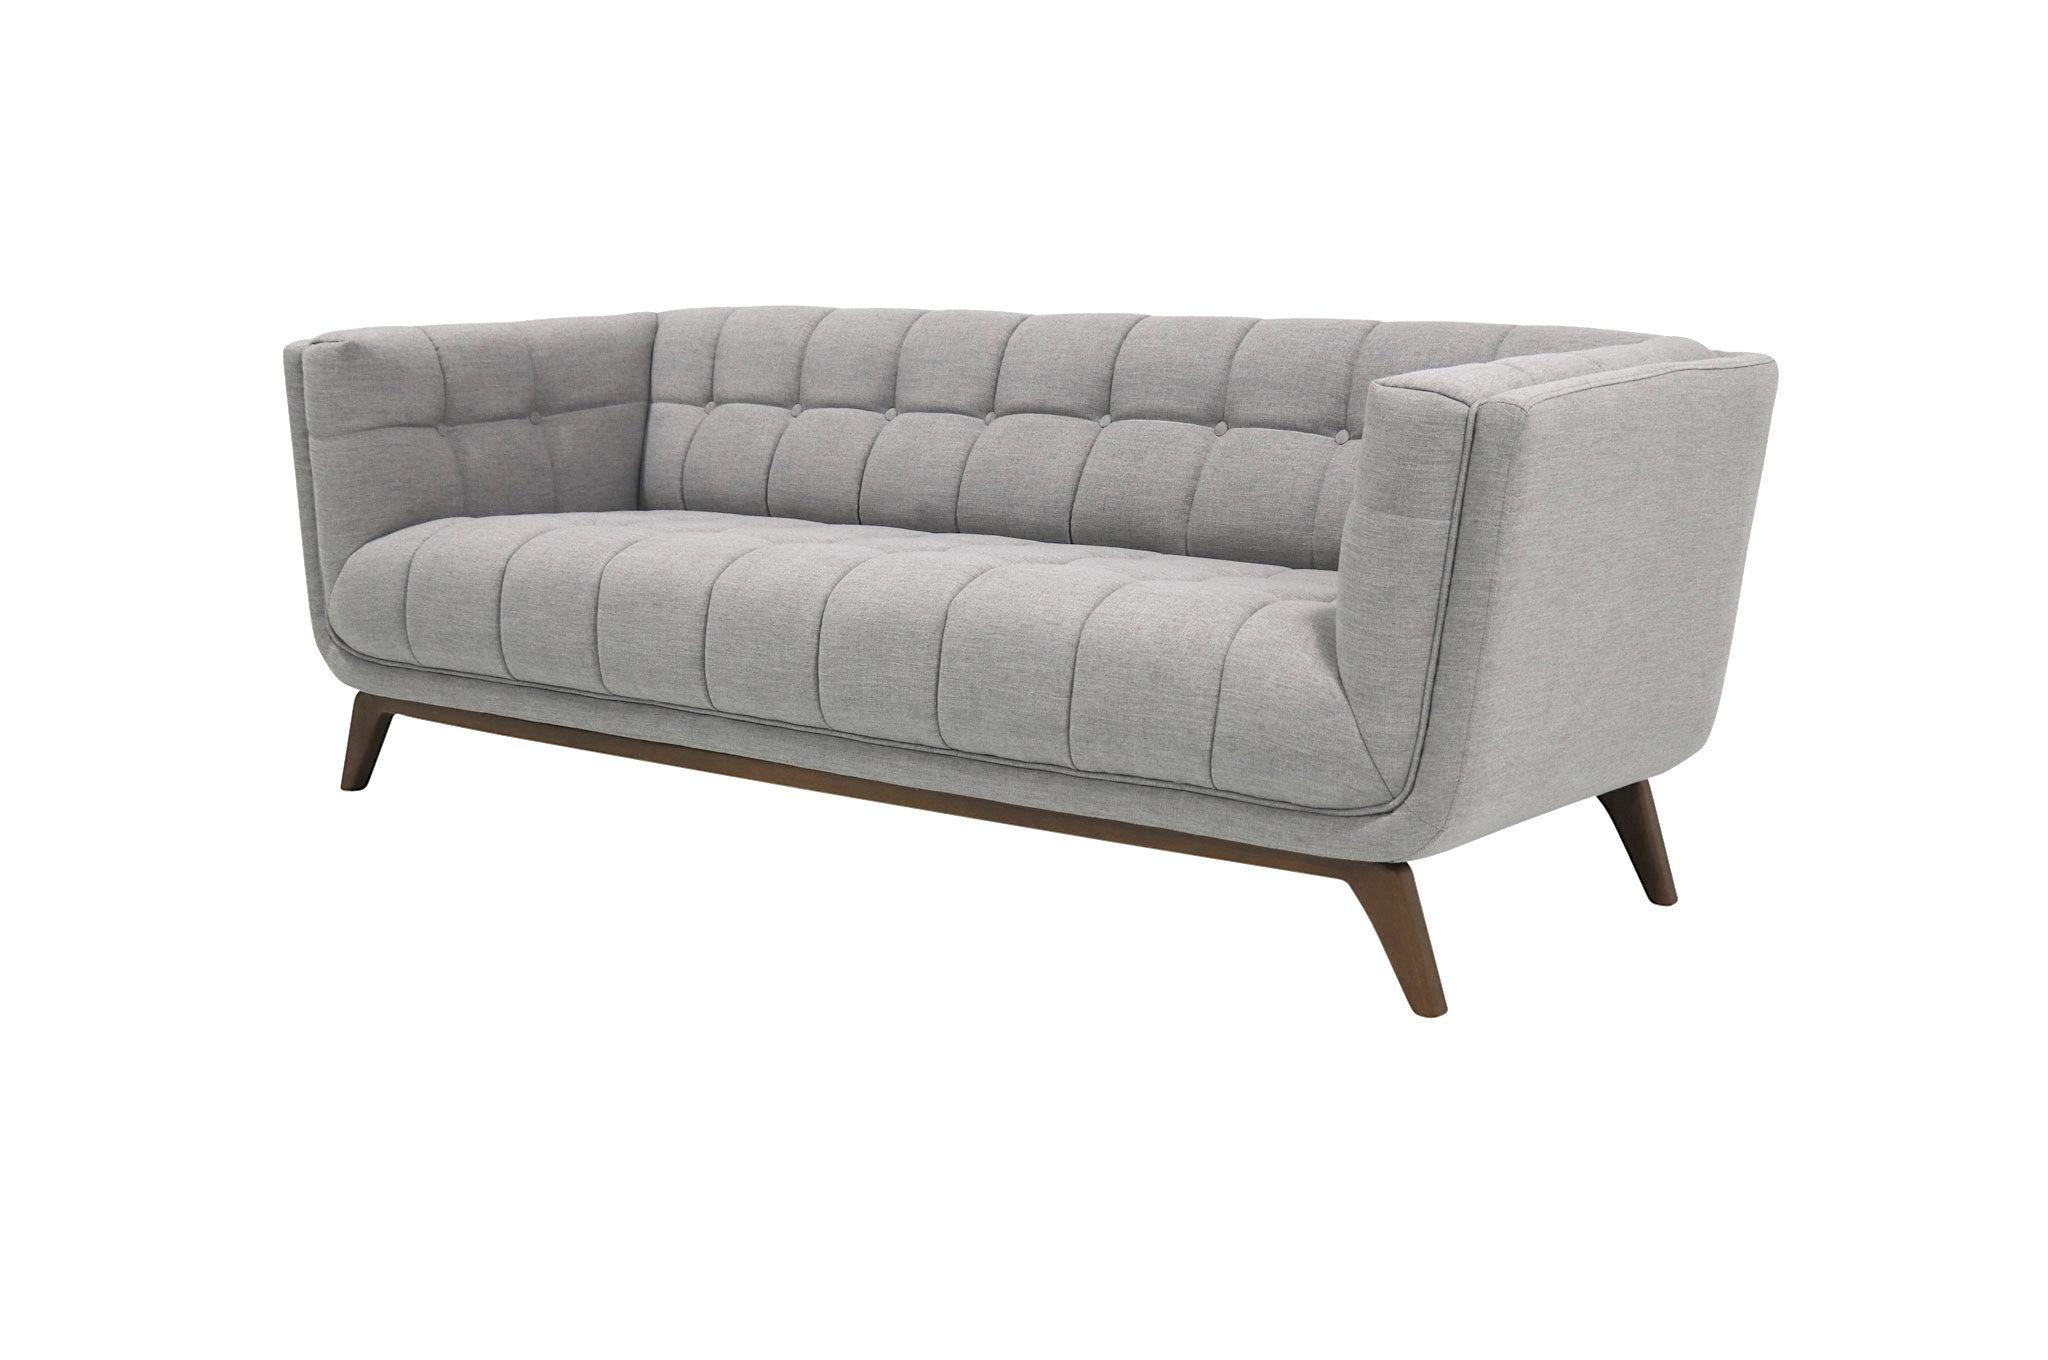 Worsley Mid Century Modern Chesterfield Sofa